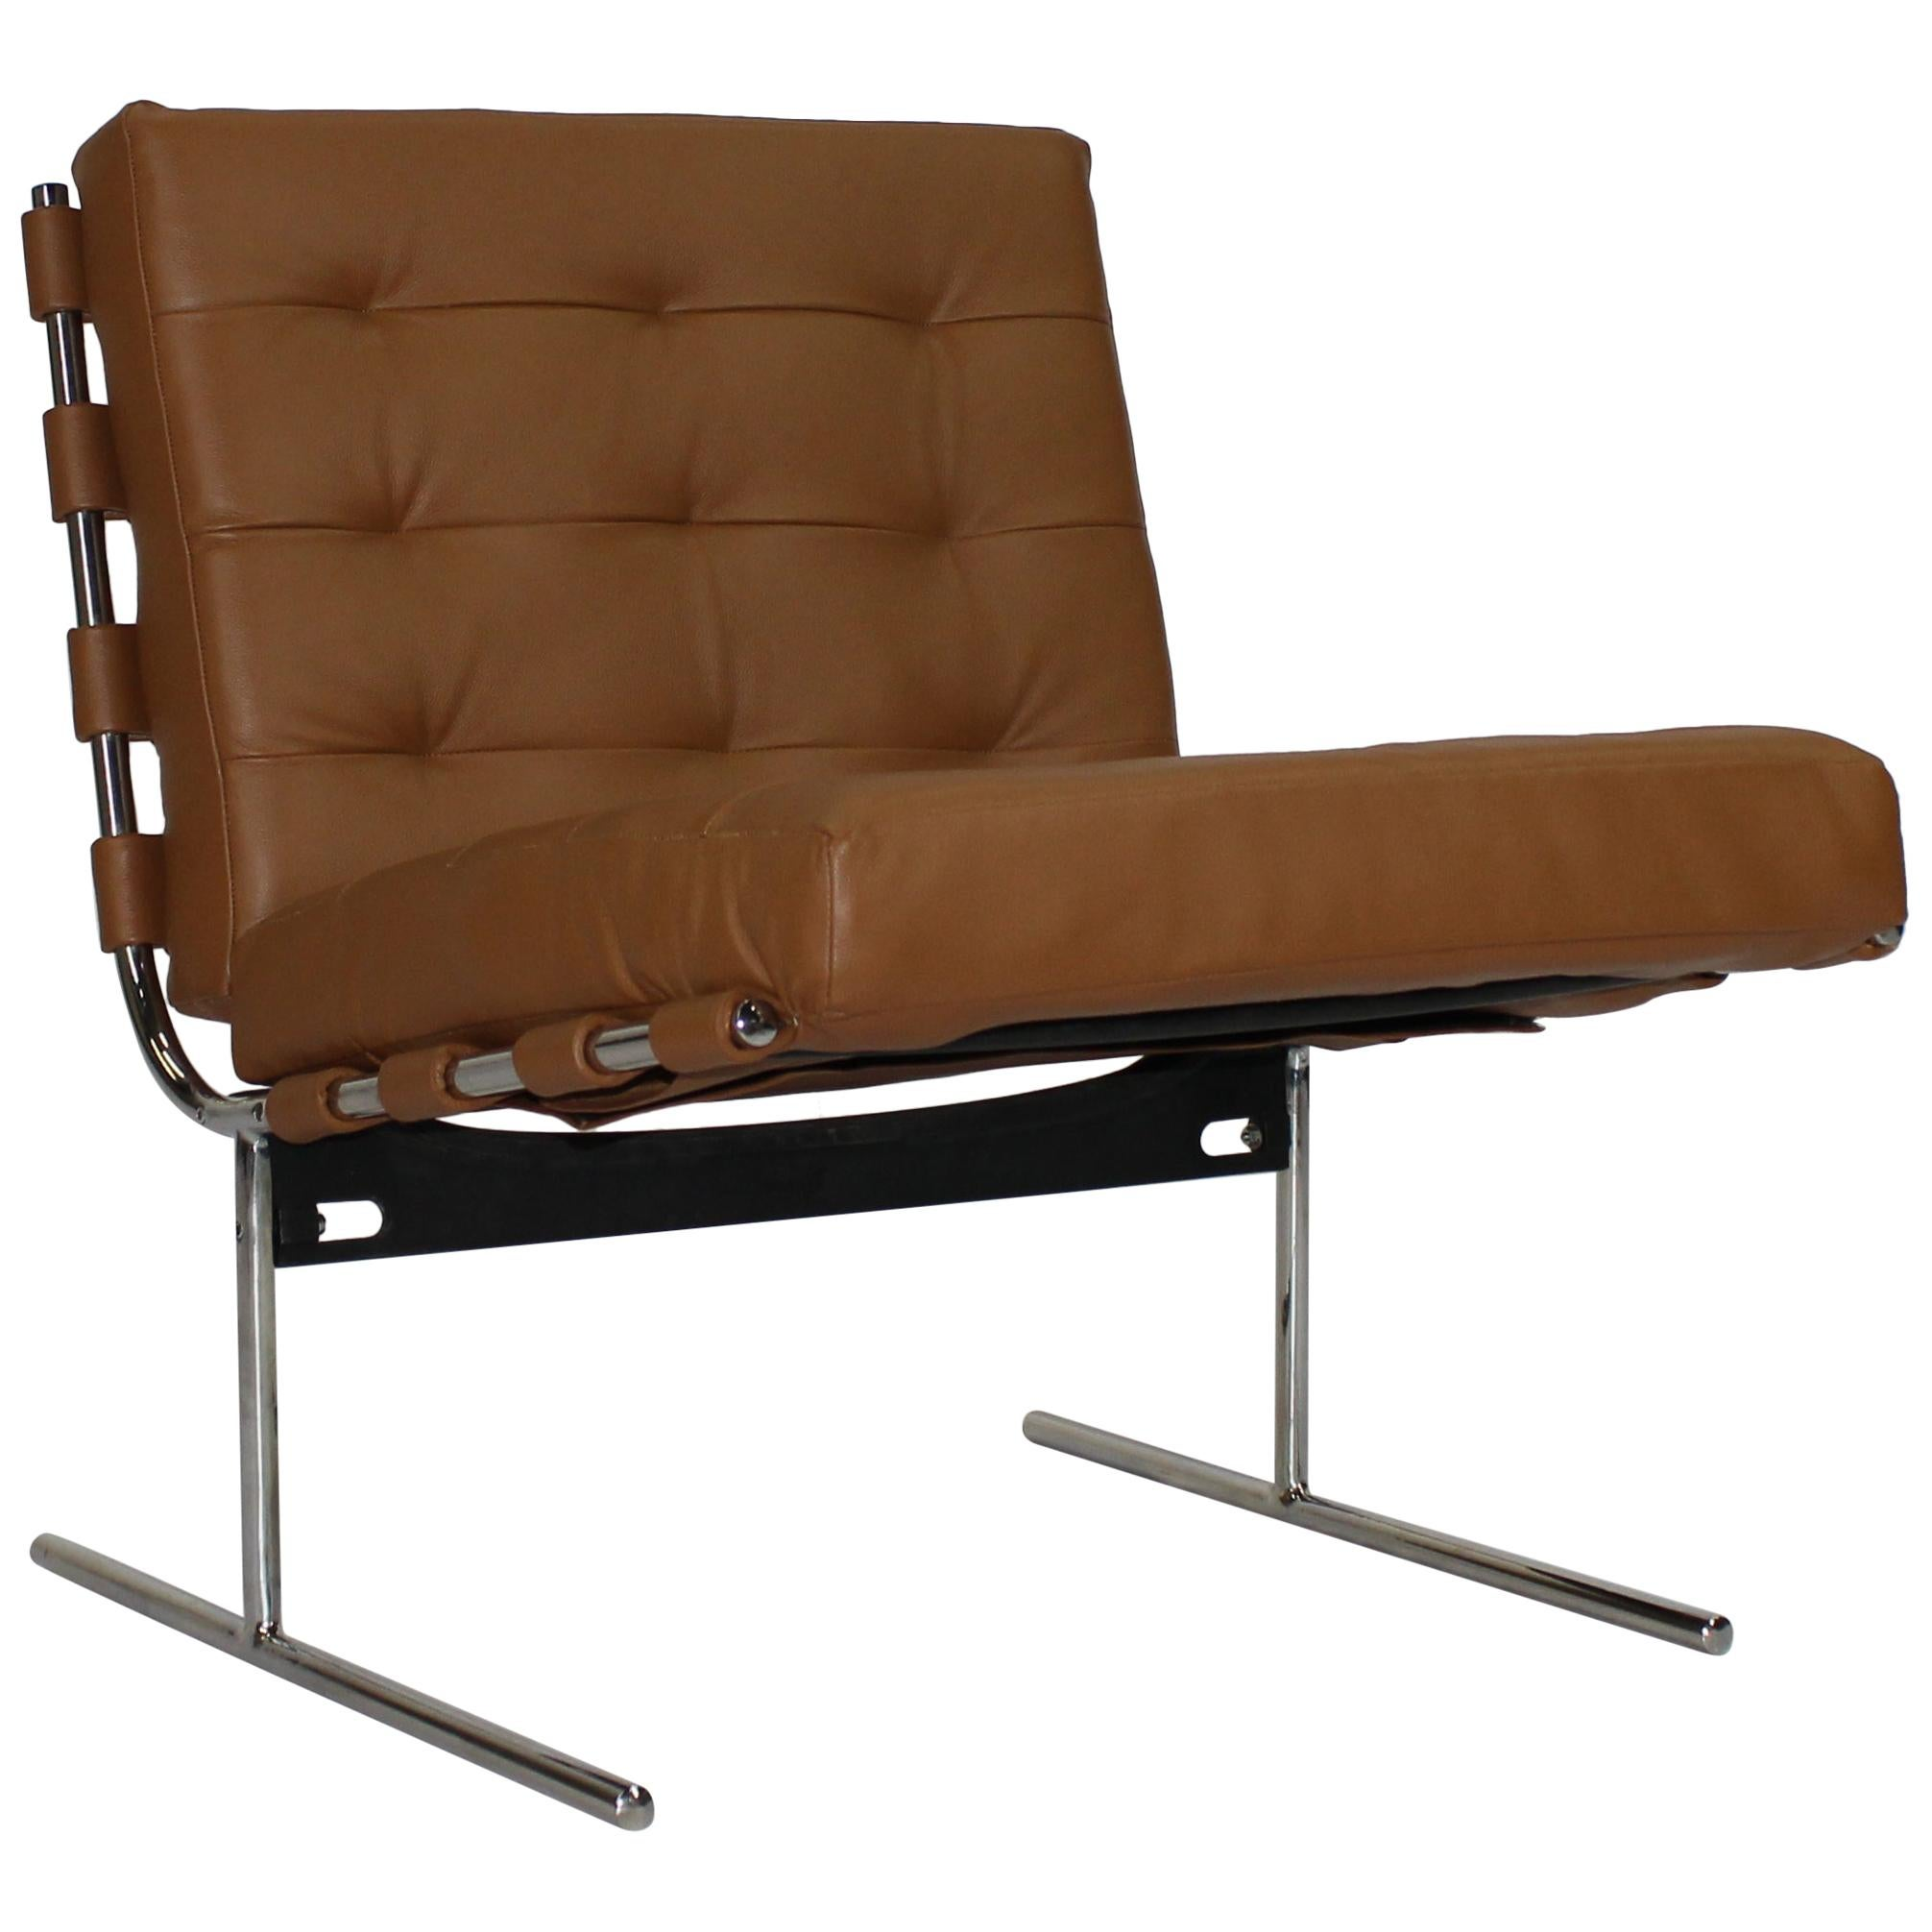 "Jorge Zalszupin ""Oxford"" Midcentury Brazilian Armchair, 1960s"